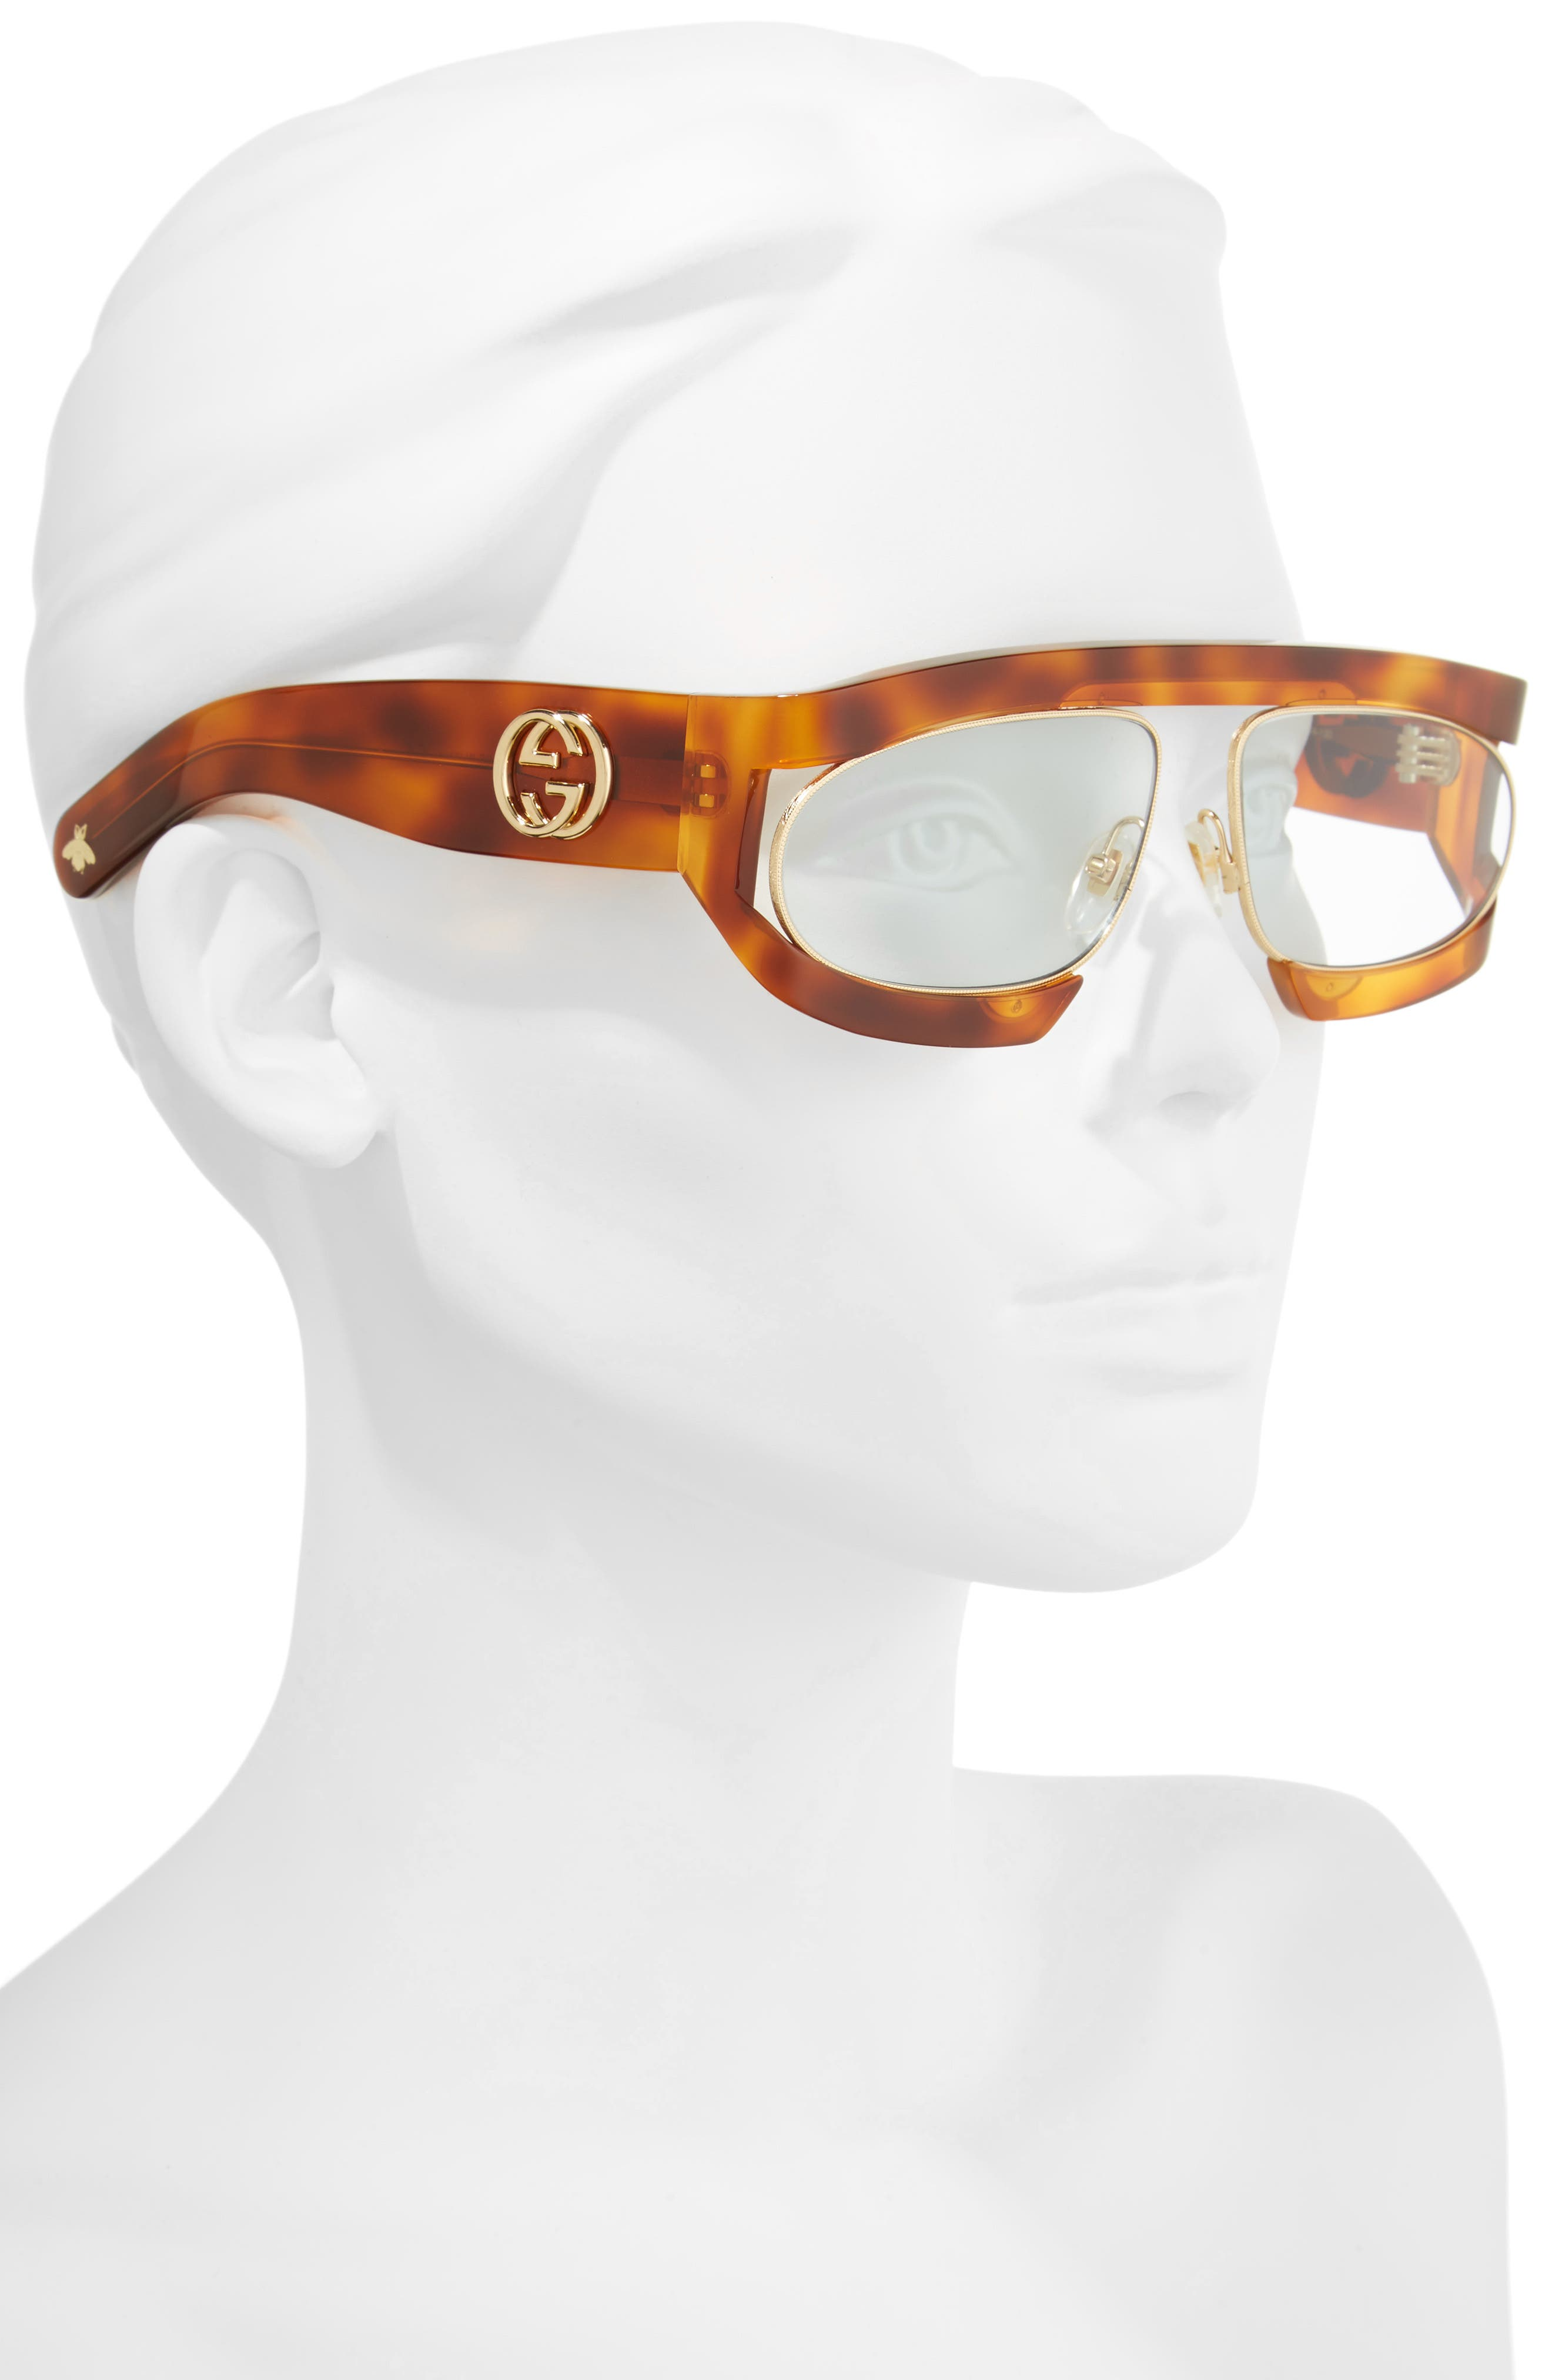 63mm Shield Glasses,                             Alternate thumbnail 2, color,                             200